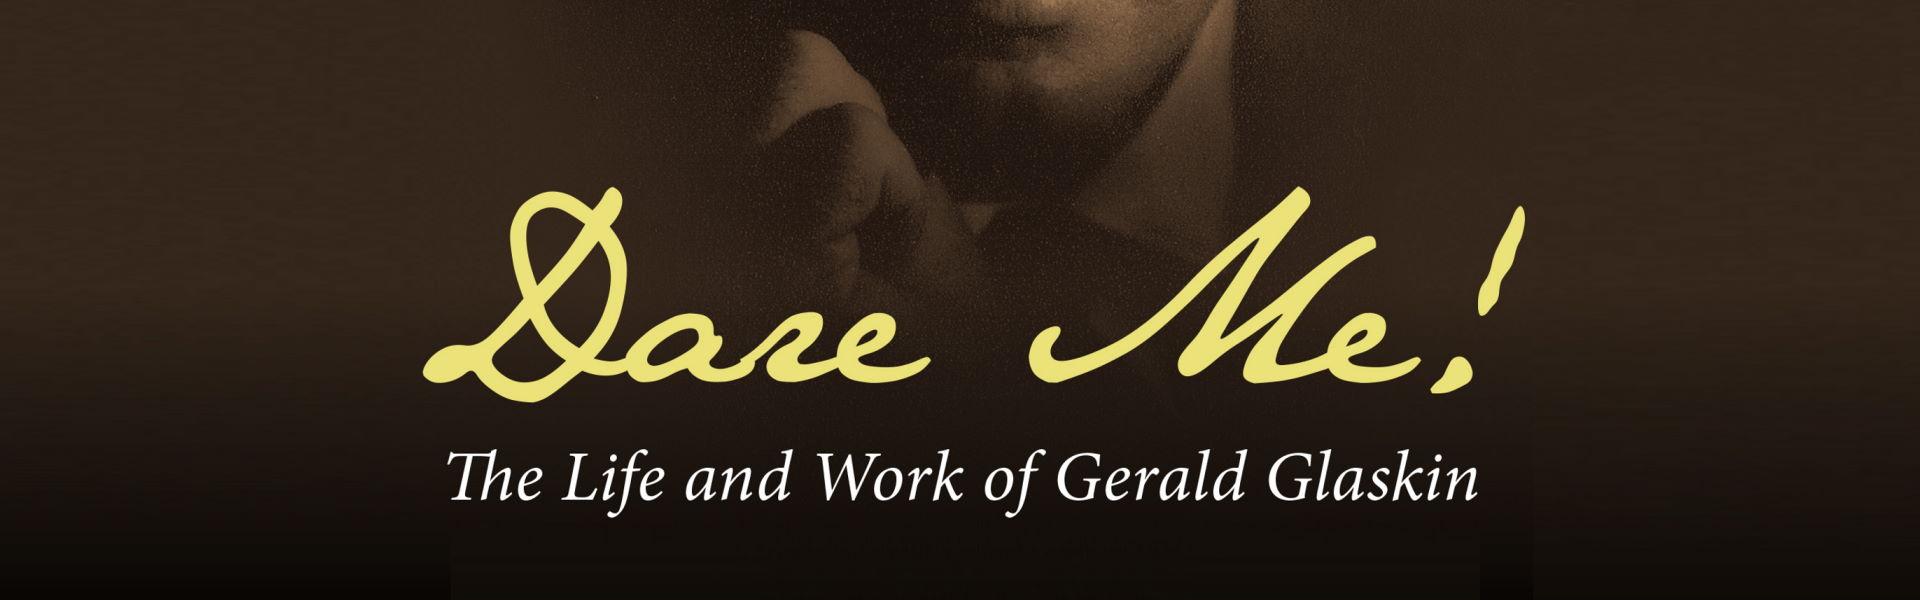 Dare me! : the life and work of Gerald Glaskin / John Burbidge (Clayton, Vic : Monash University Publishing, 2014)